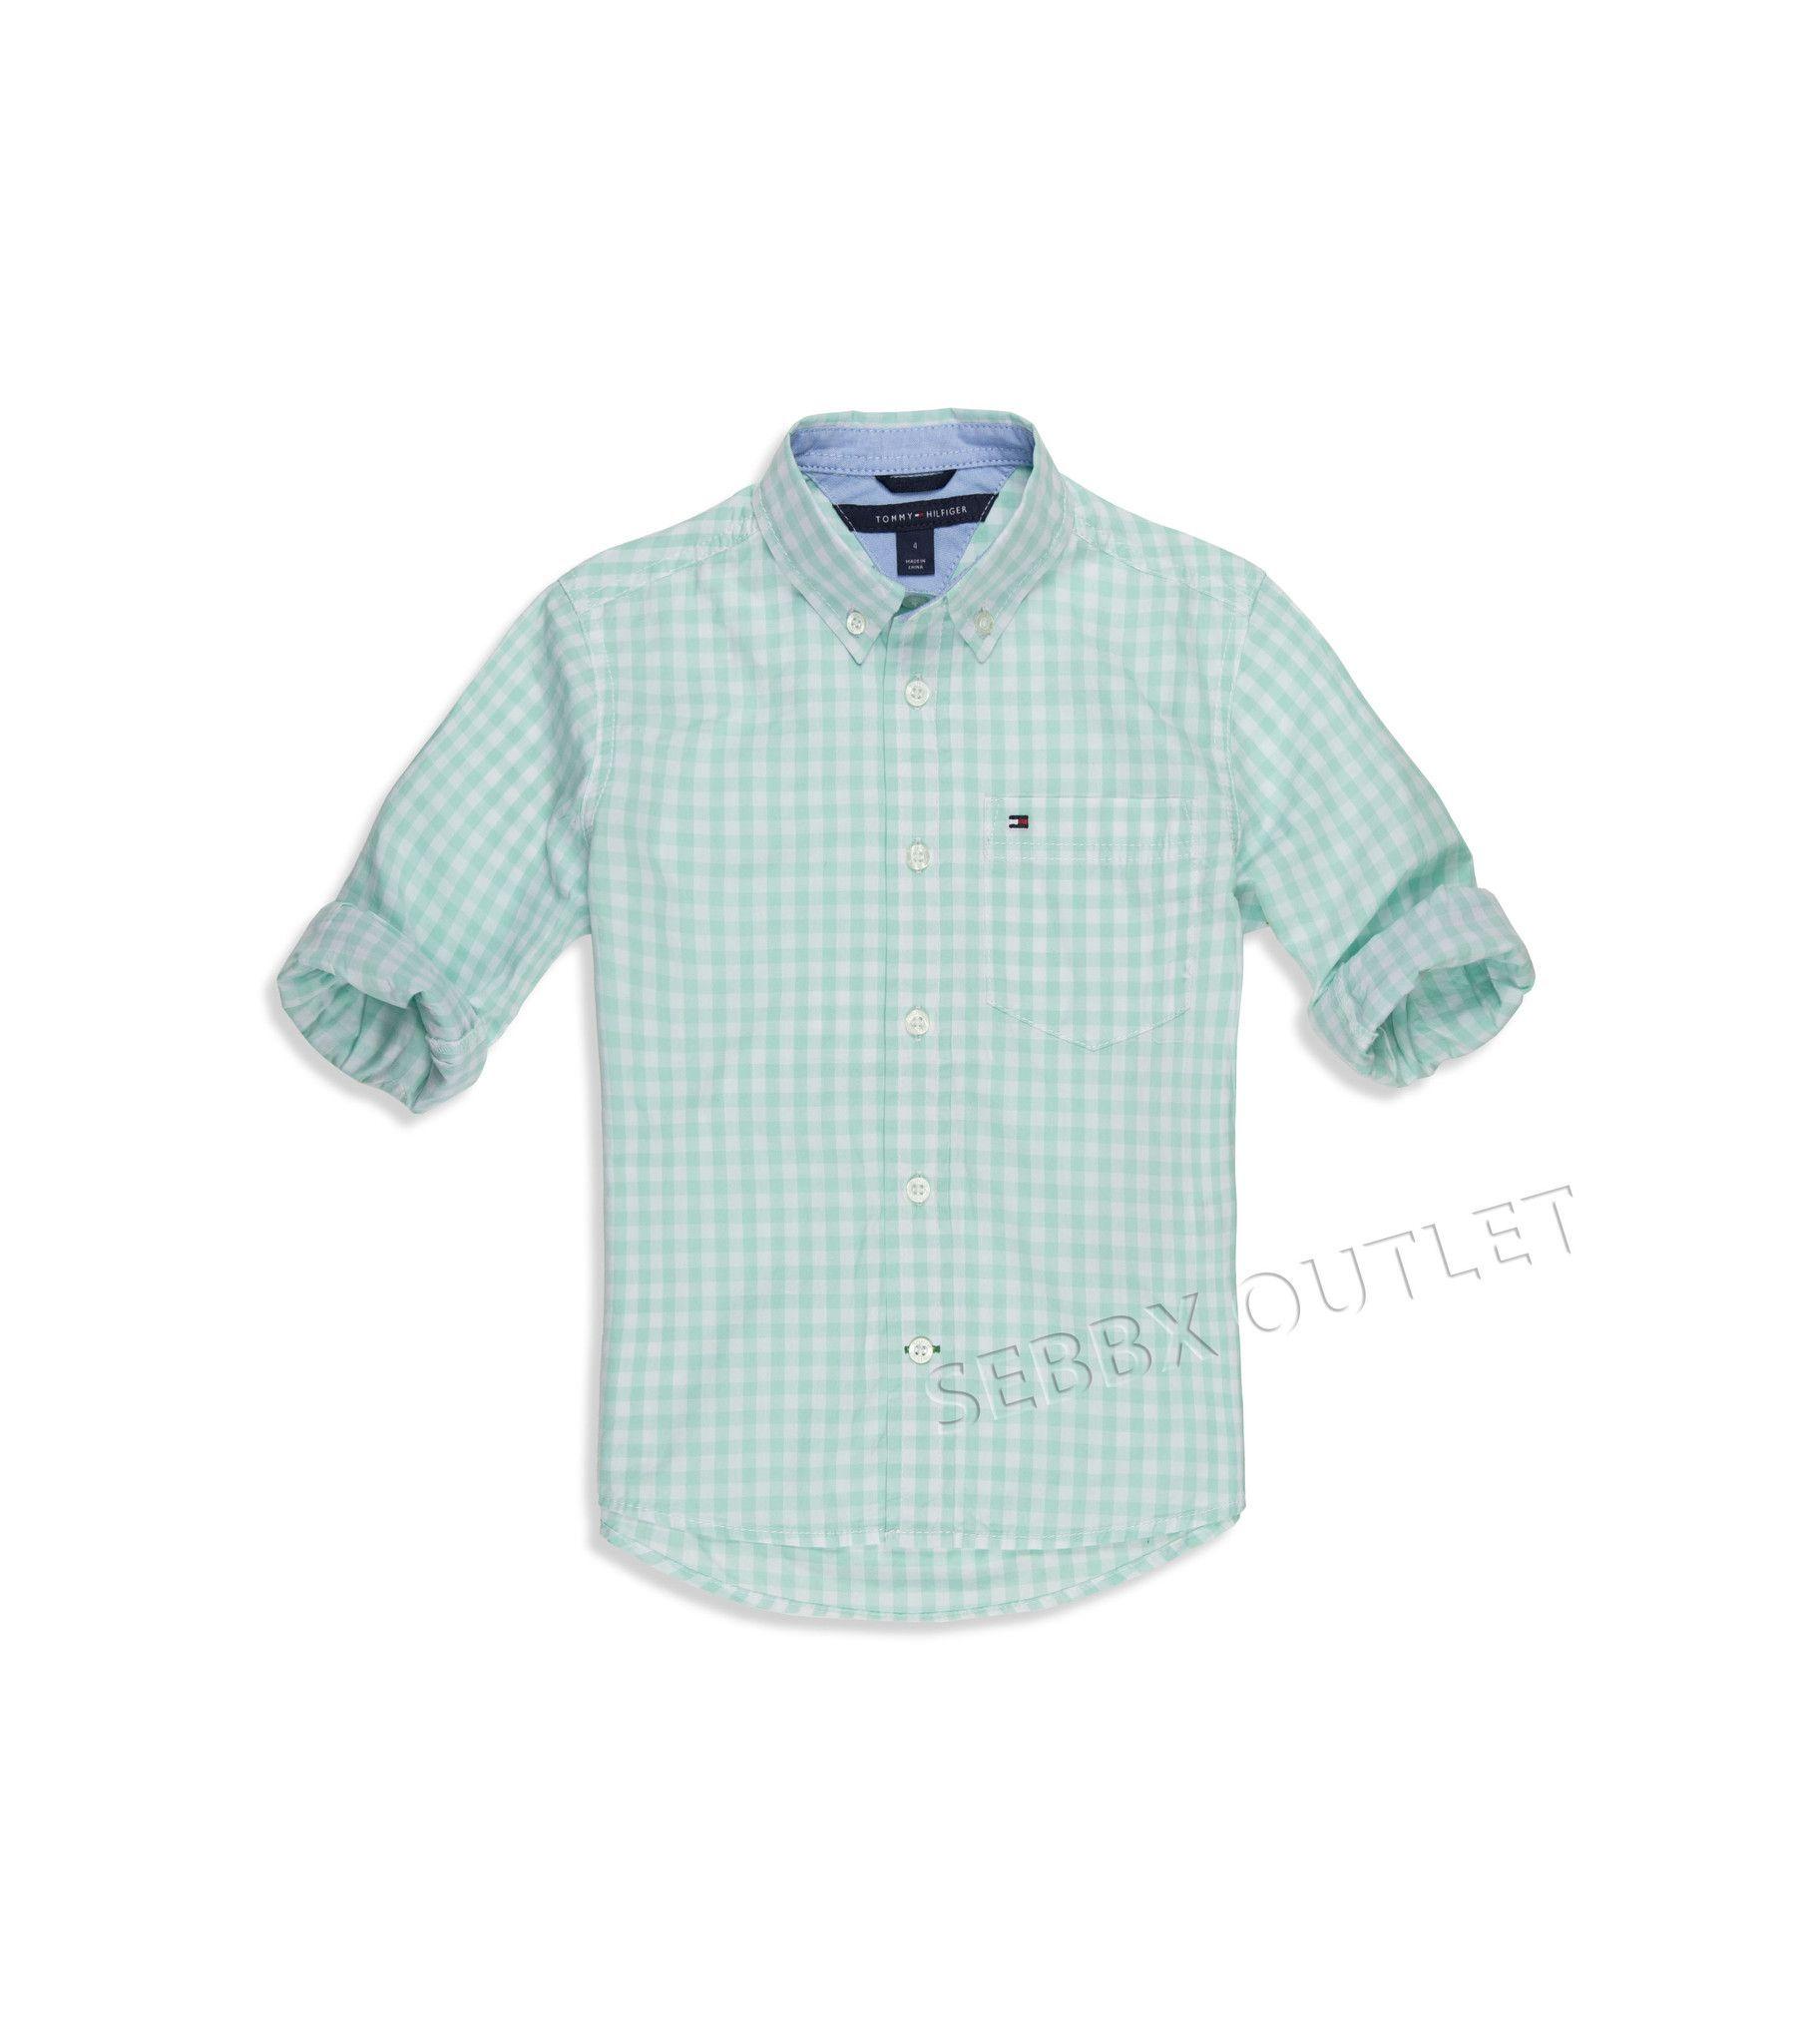 Tommy Hilfiger Shirt Button Down Mint Green Checkered Boys Shirts